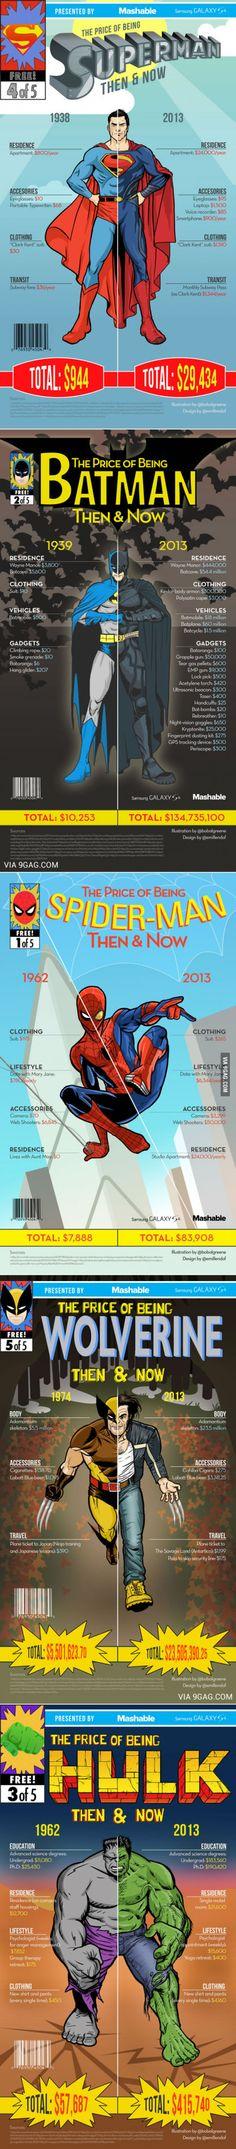 The Price of Being Superheroes Then & Now: Superman, Batman, Spider-Man, Wolverine, Hulk